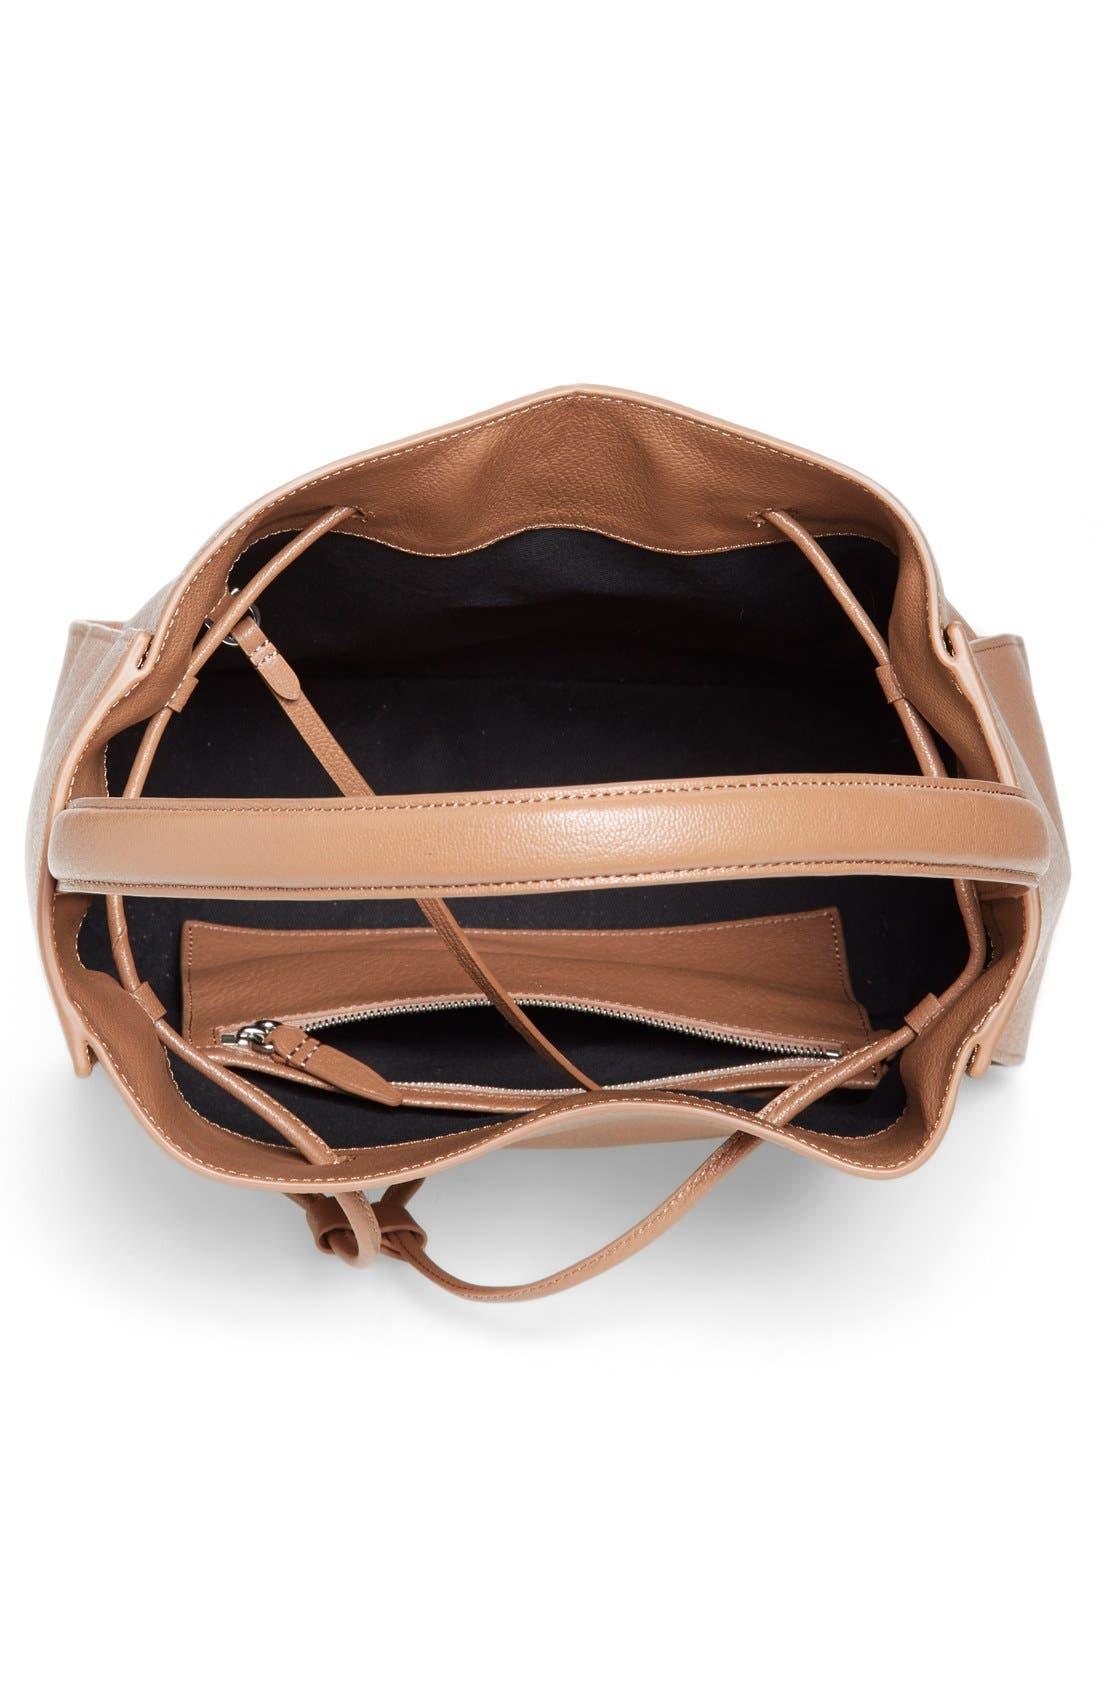 'Large Soleil' Leather Bucket Bag,                             Alternate thumbnail 15, color,